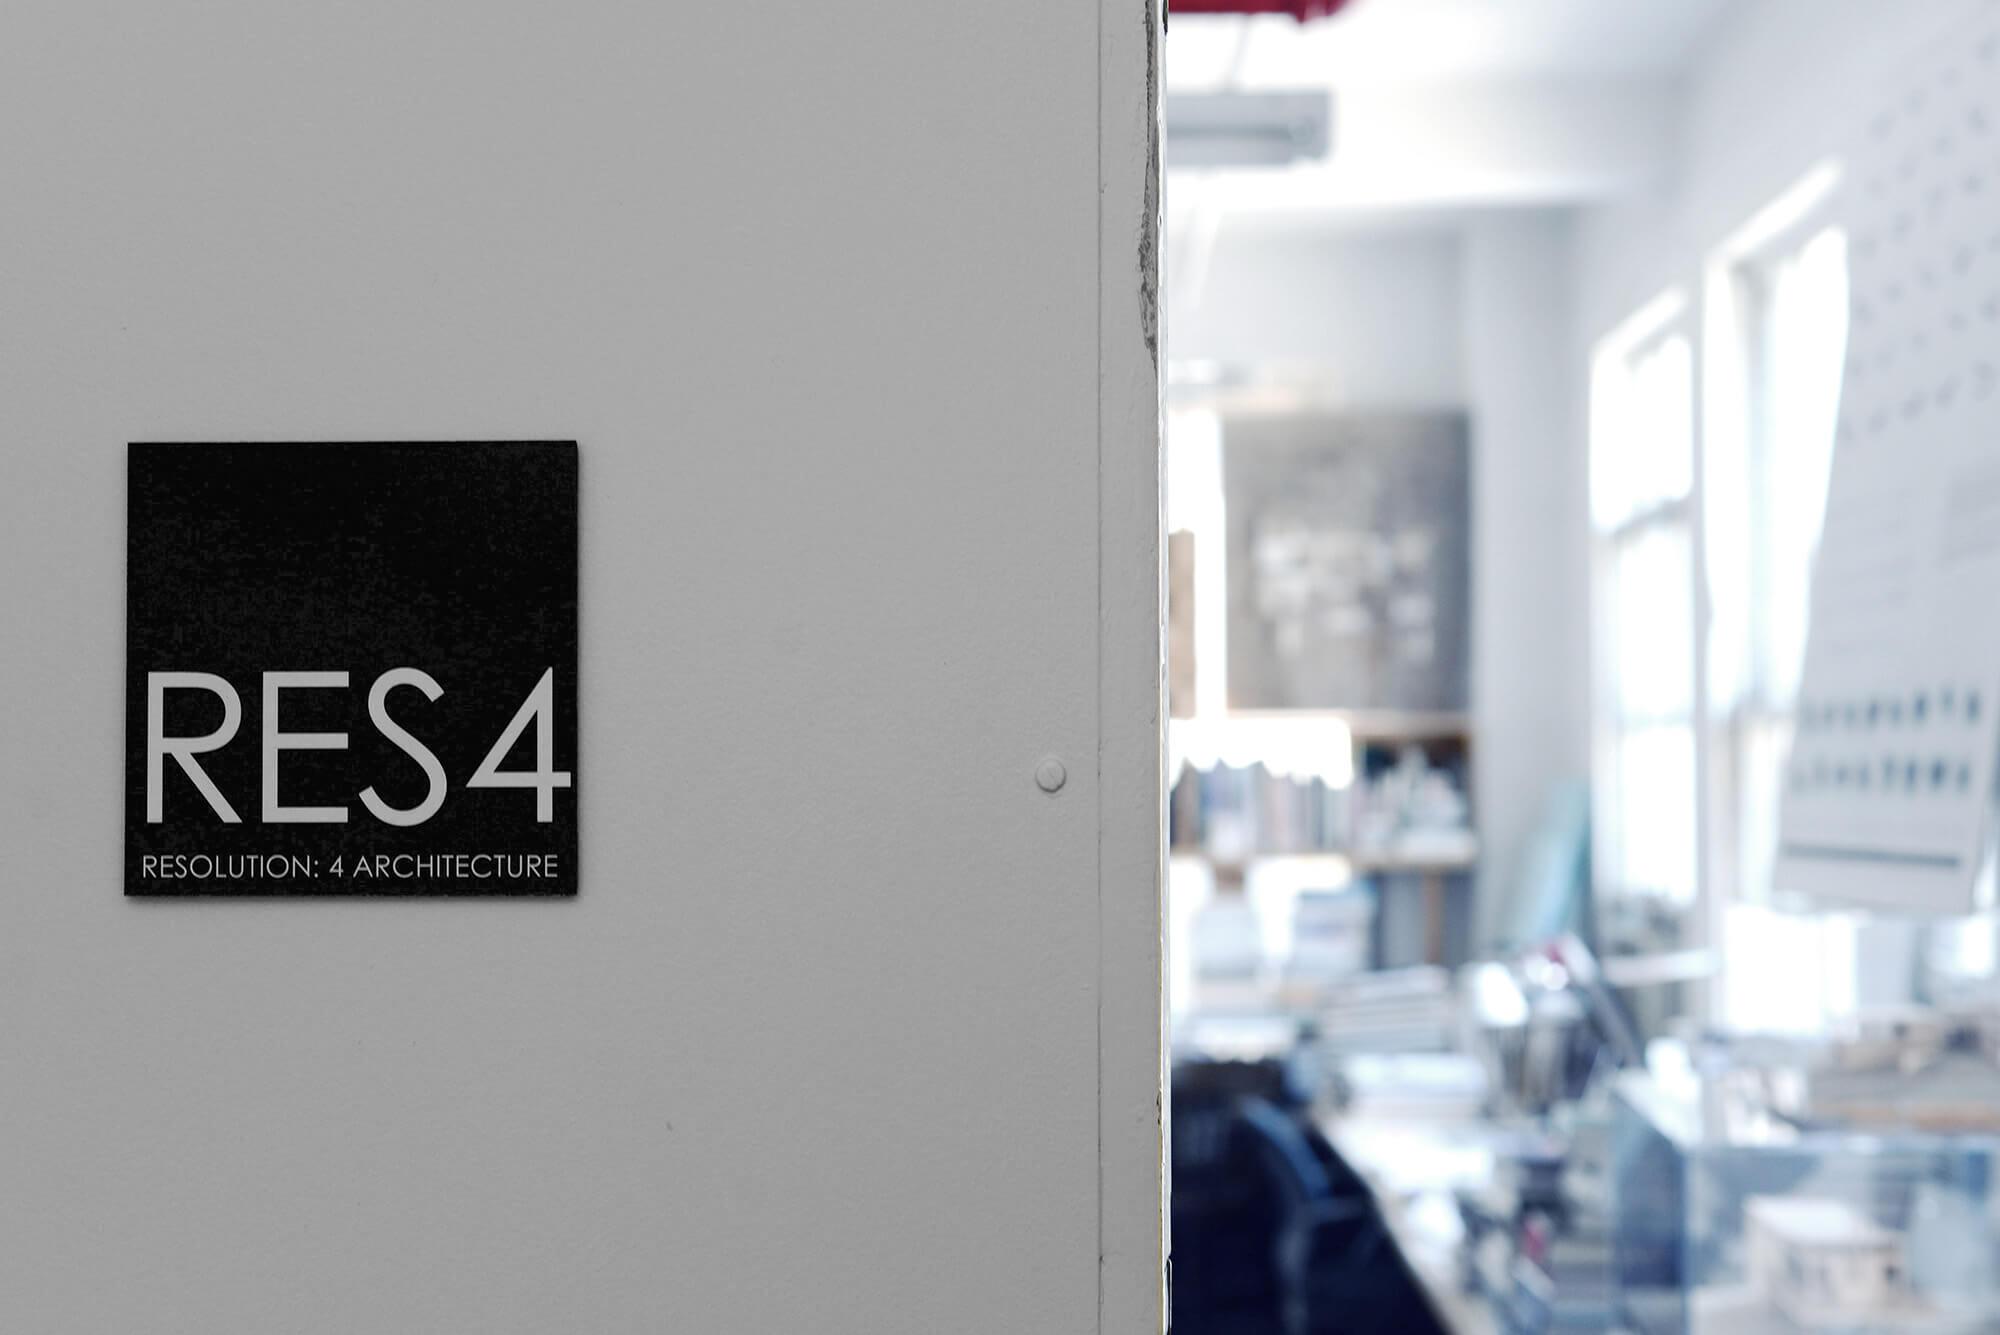 res4-studio-logo.jpg